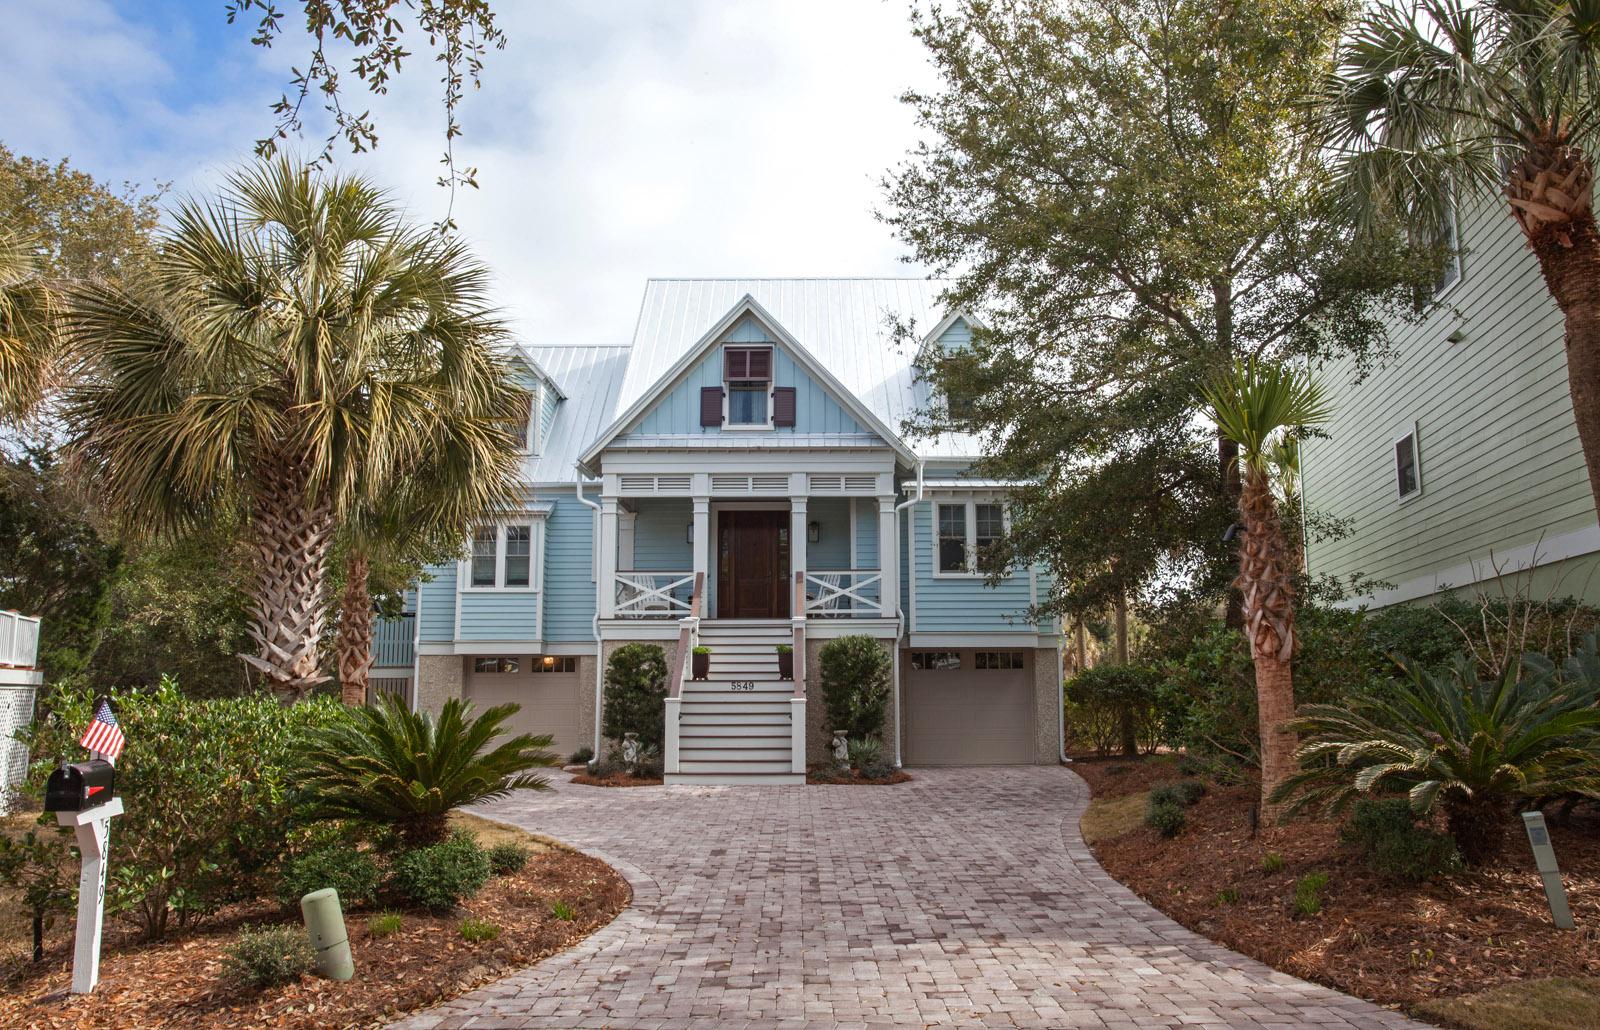 This coastal home has a 5-V Galvalume roof.